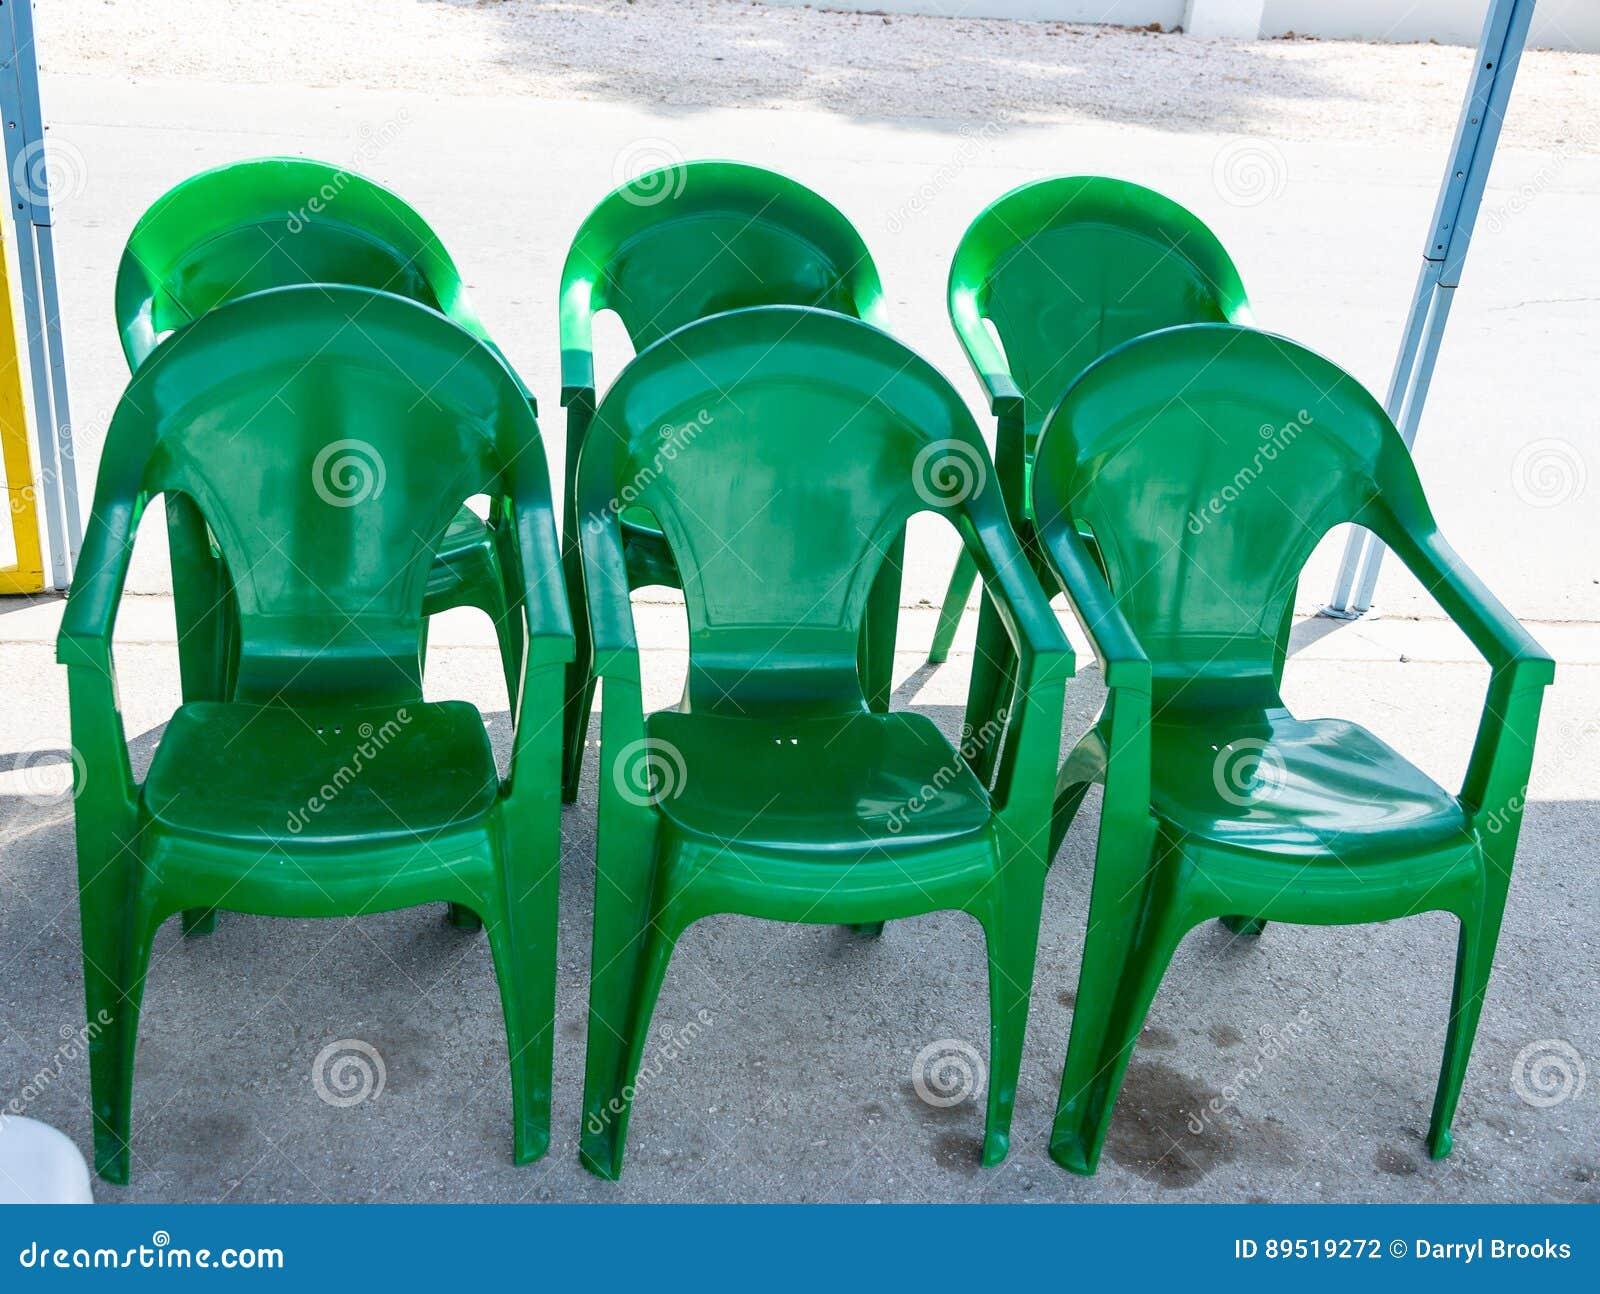 Sedie Verdi Di Plastica.Sei Sedie Di Plastica Verdi Fotografia Stock Immagine Di Mobilia